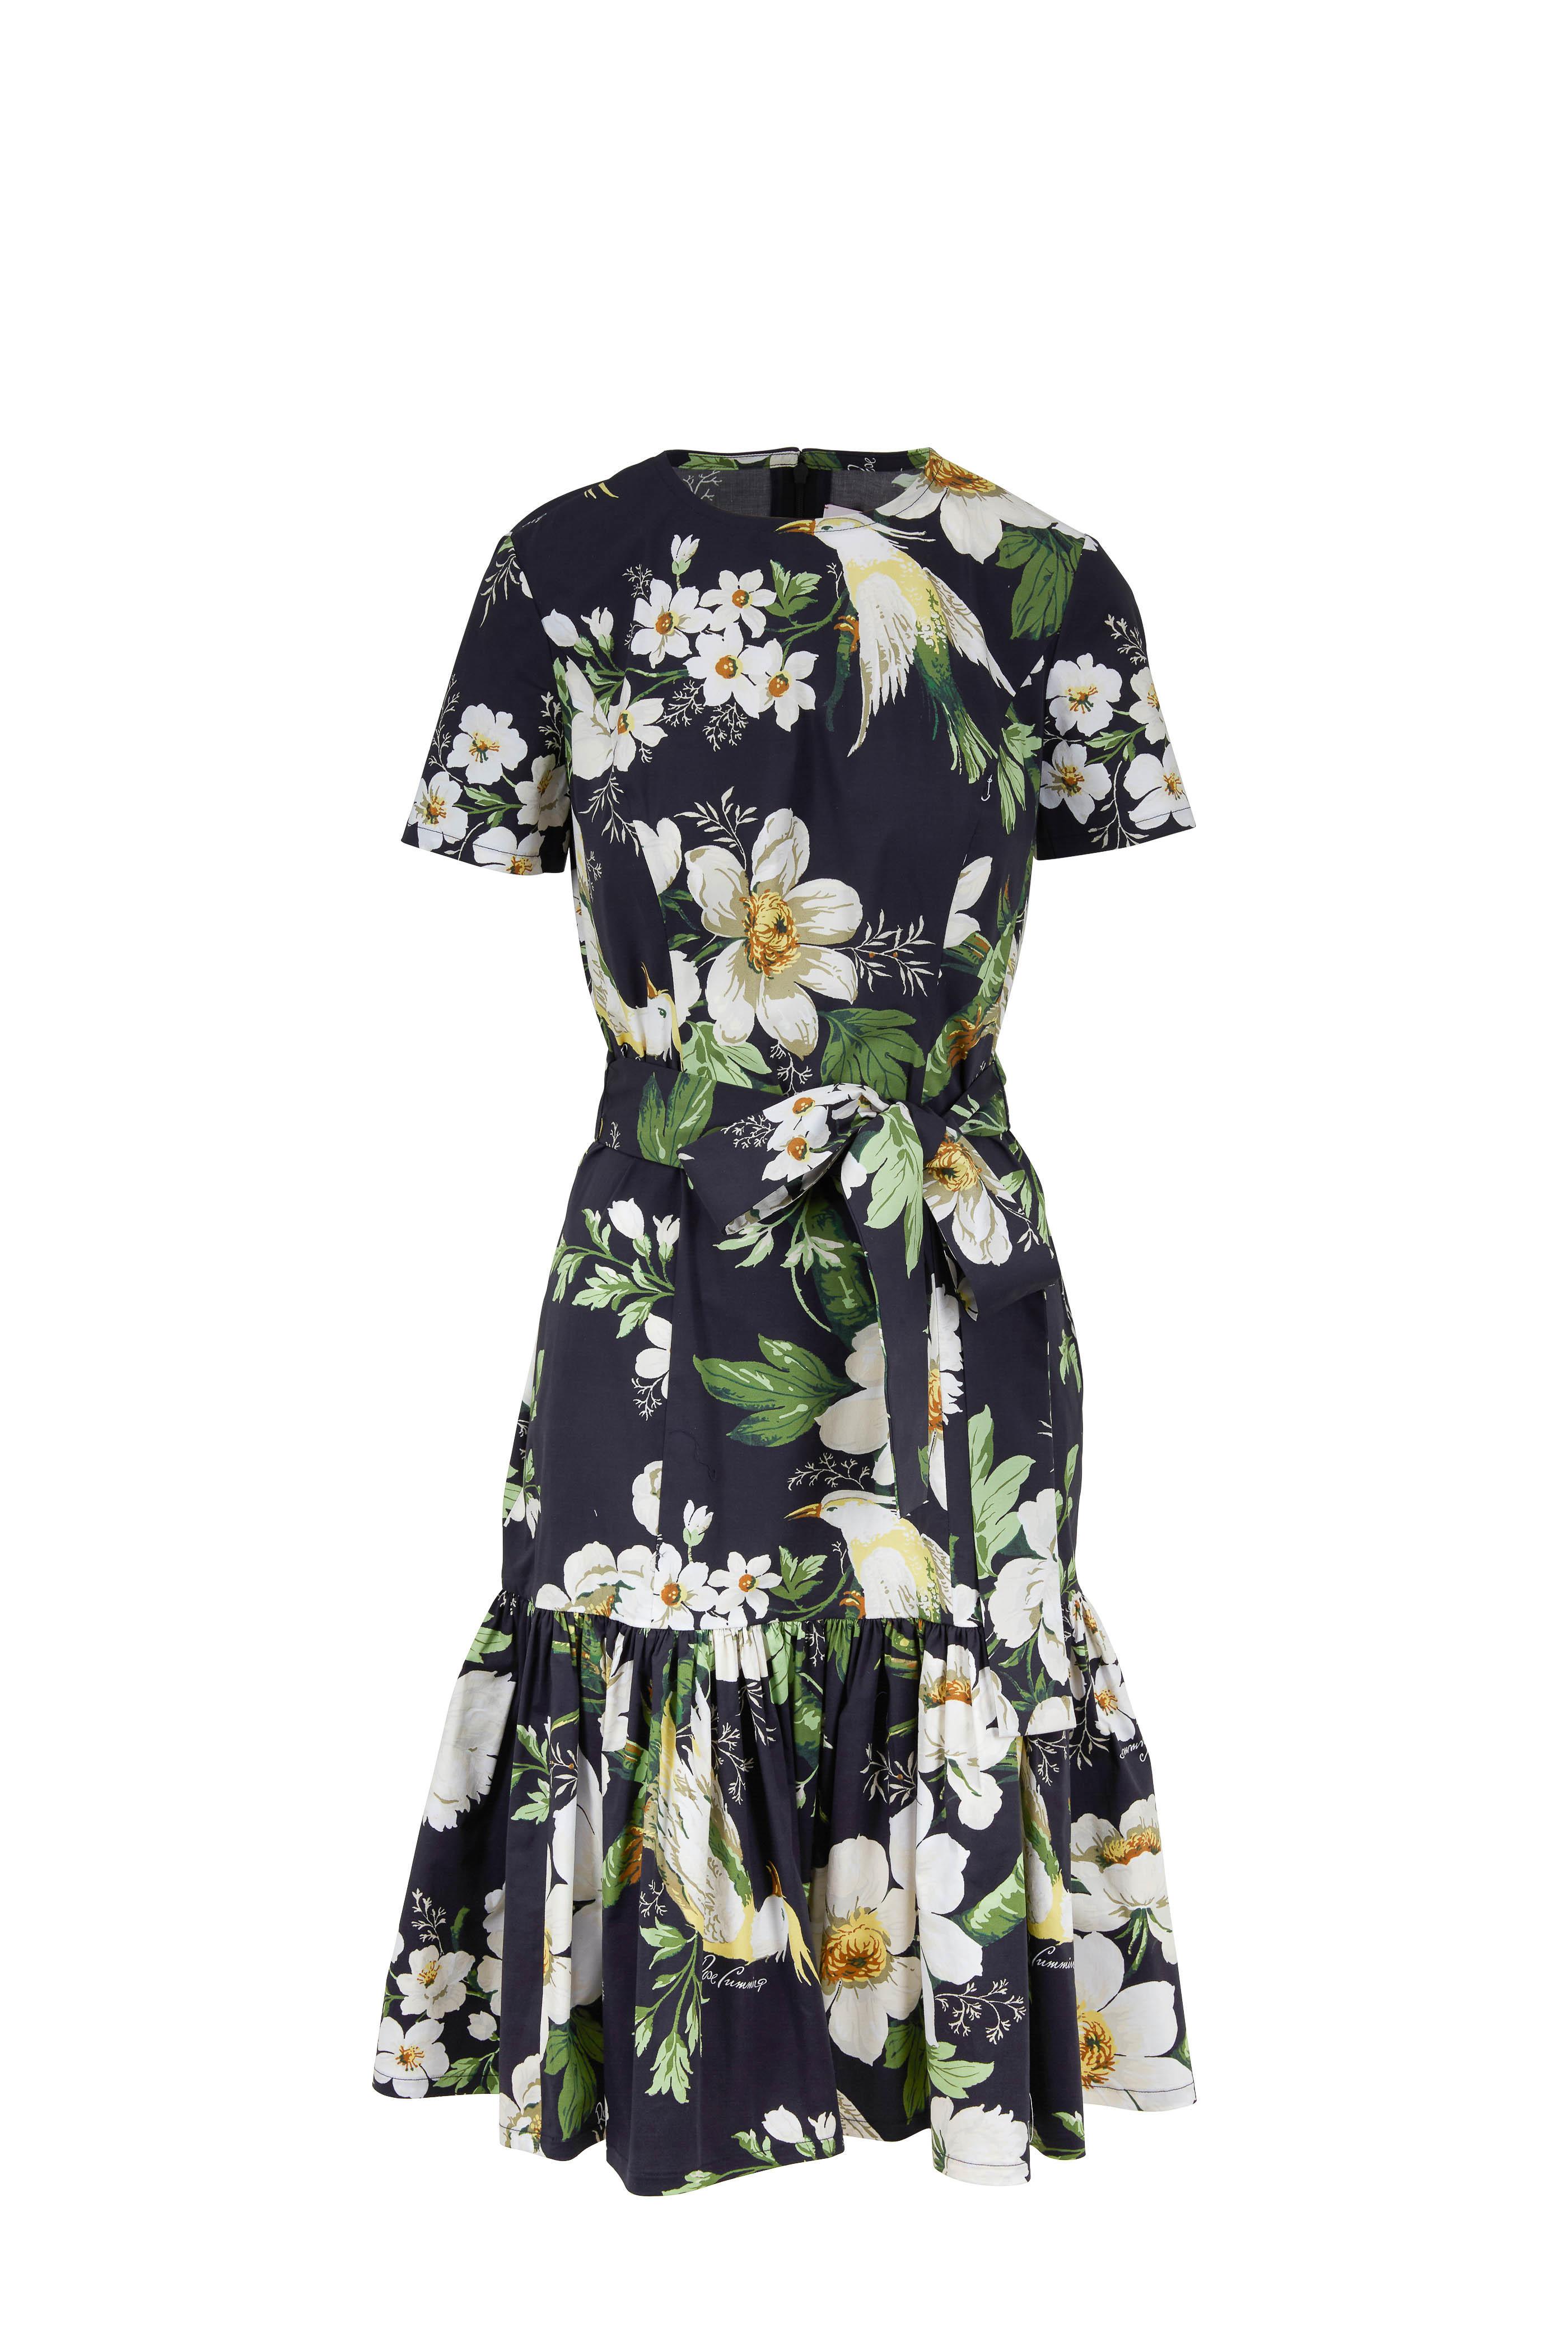 90970b269bc1c Carolina Herrera - Black Multi Floral Printed Stretch Cotton Dress ...